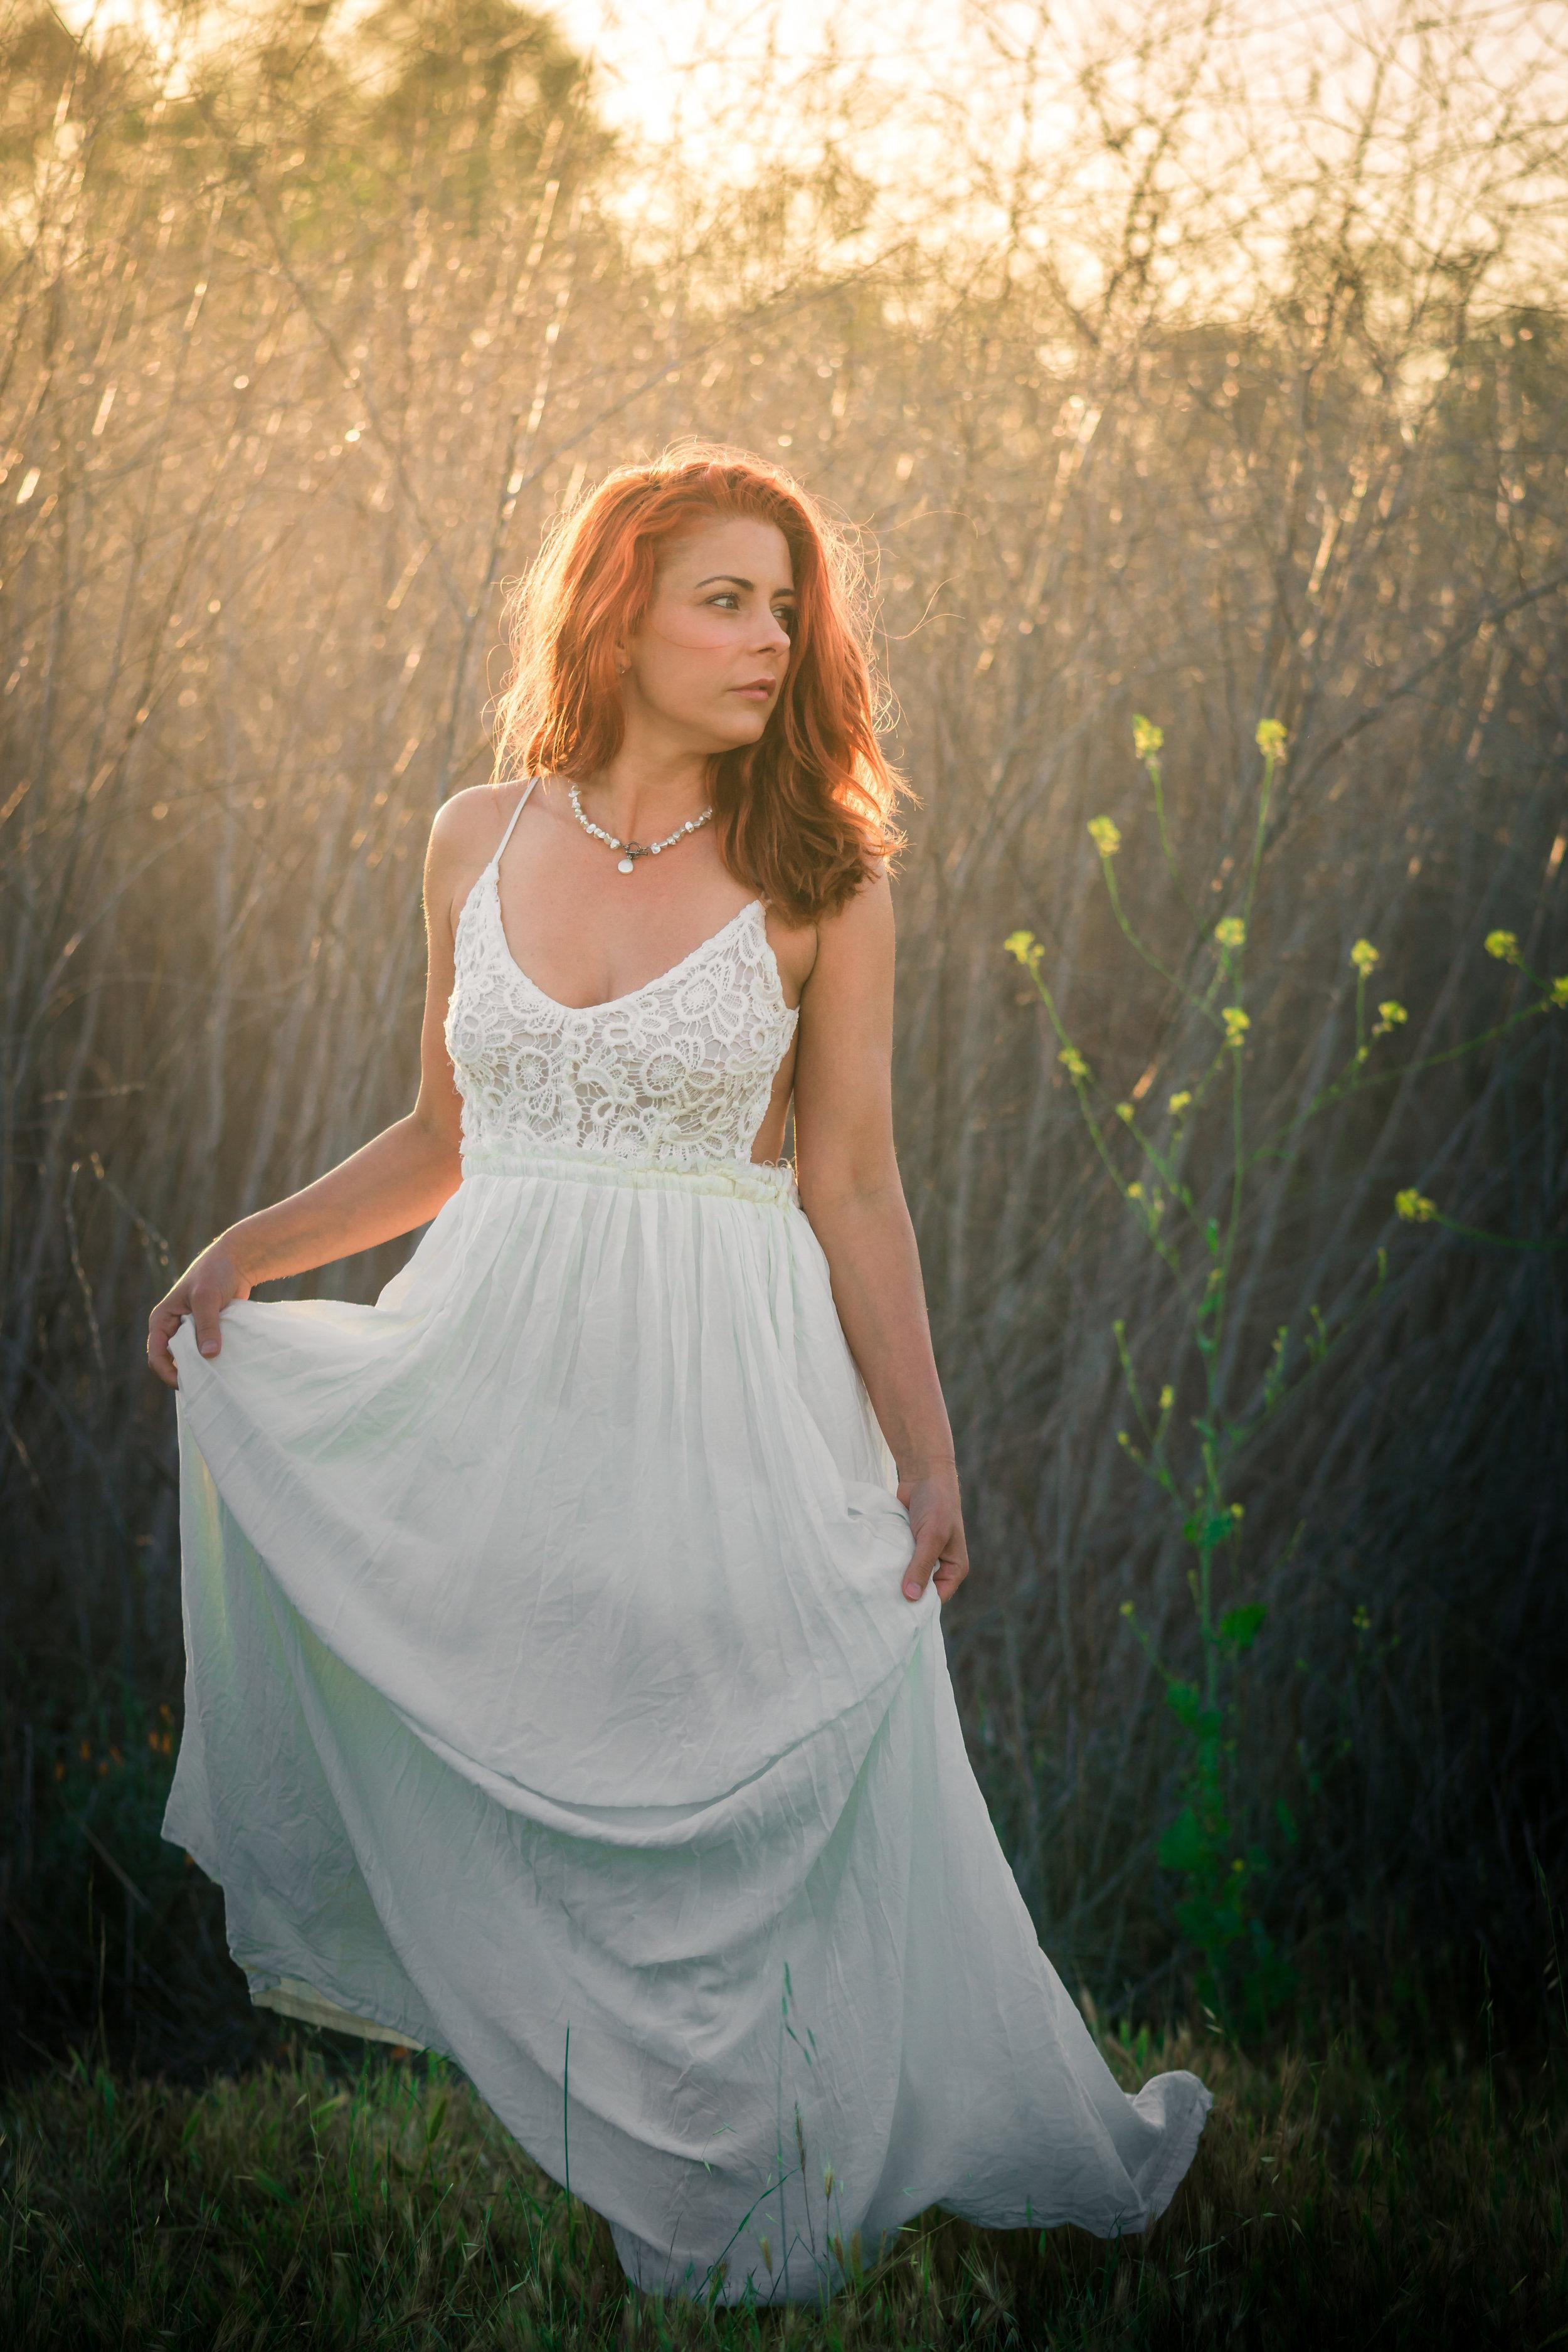 1_Dione-faves-Newport-fine-art-portraits_Joseph-Barber-Photography_04719.jpg